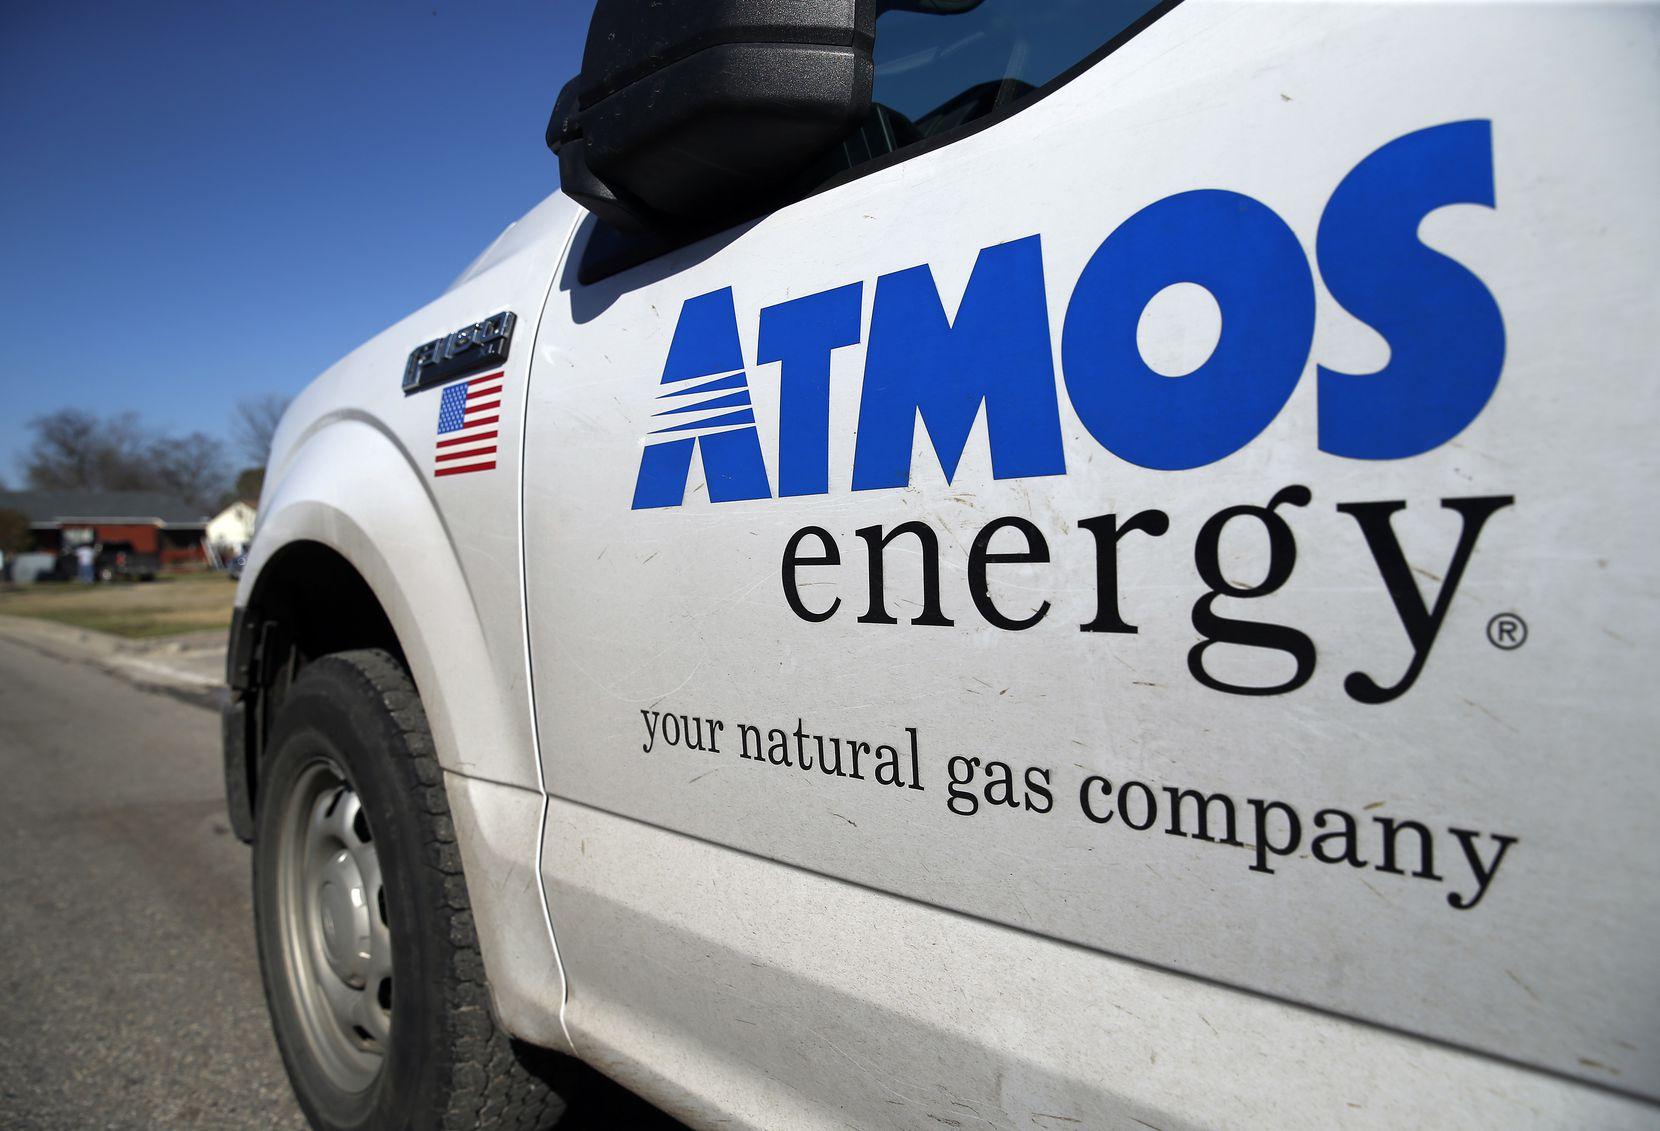 An Atmos Energy gas truck patrols a Dallas neighborhood.